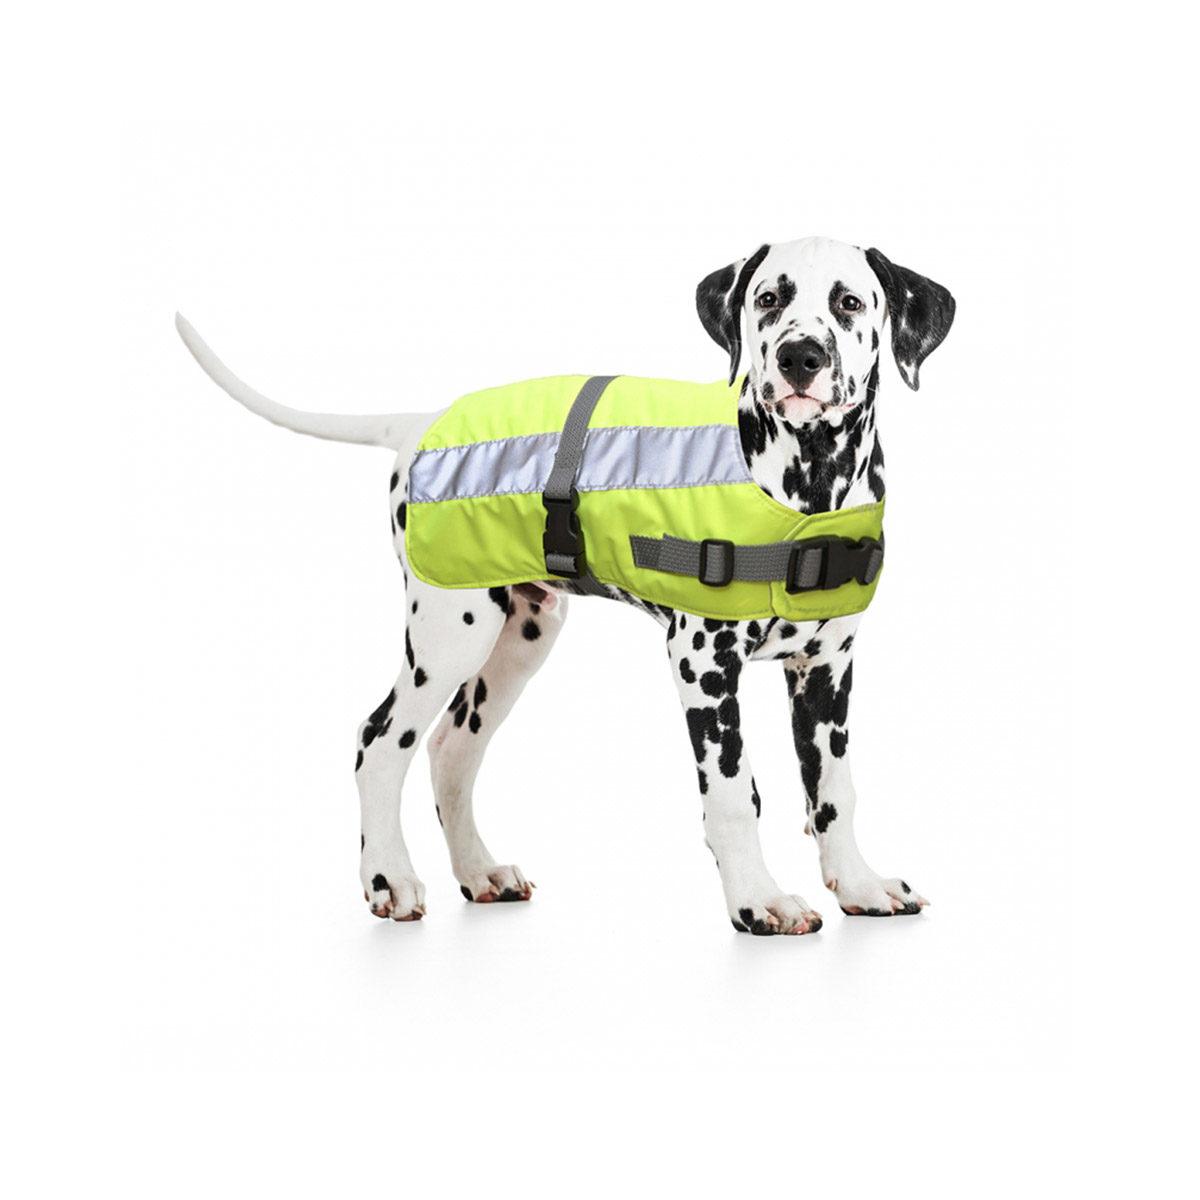 Duvo+ Flectalon Hi Vis Honden Jack Ruglengte 55 cm Geel - in Reflectie & Verlichting